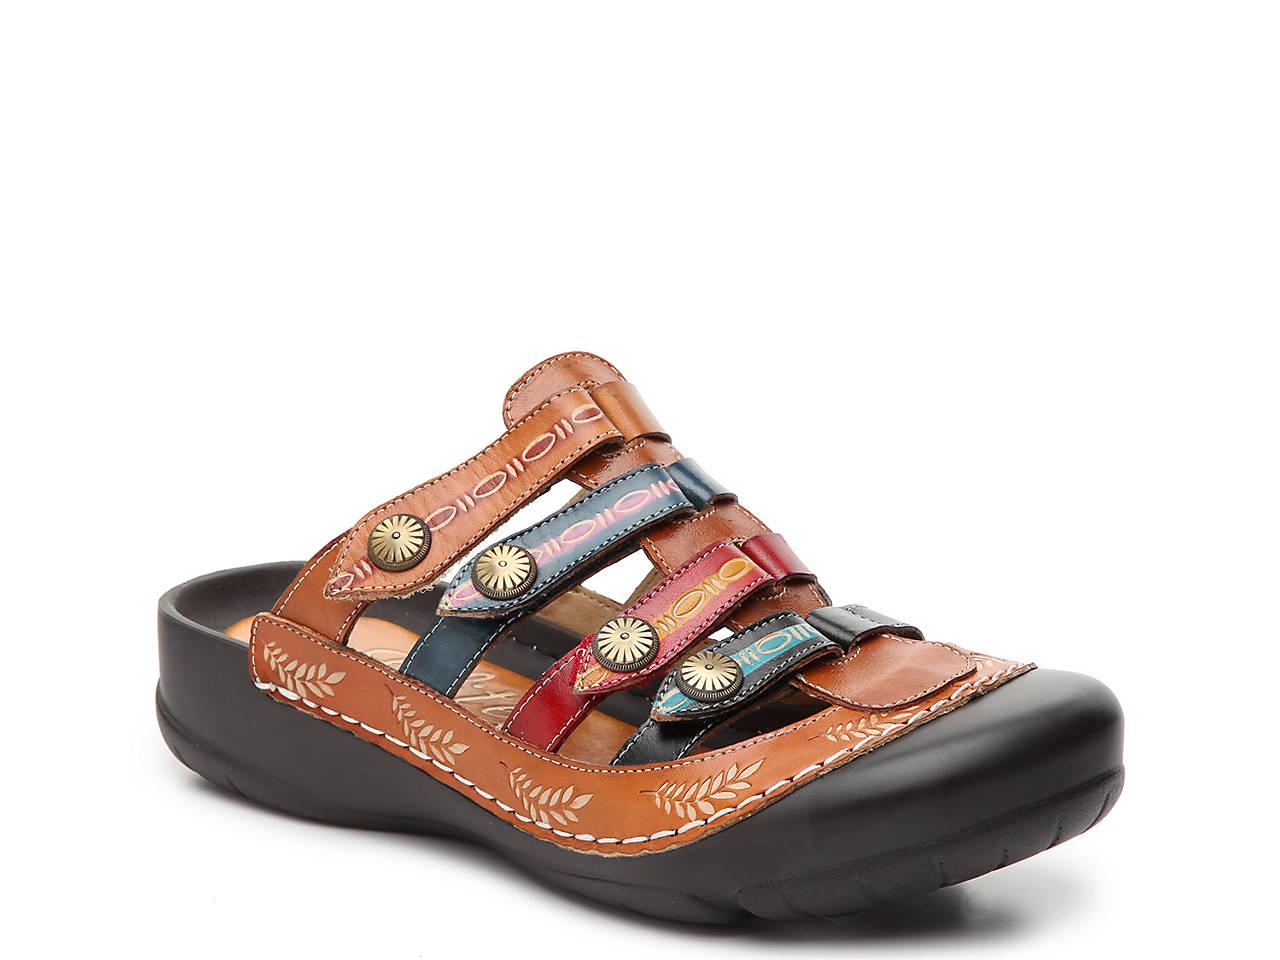 d0872ae7e2ee Elite by Corkys Heidi Clog Women s Shoes